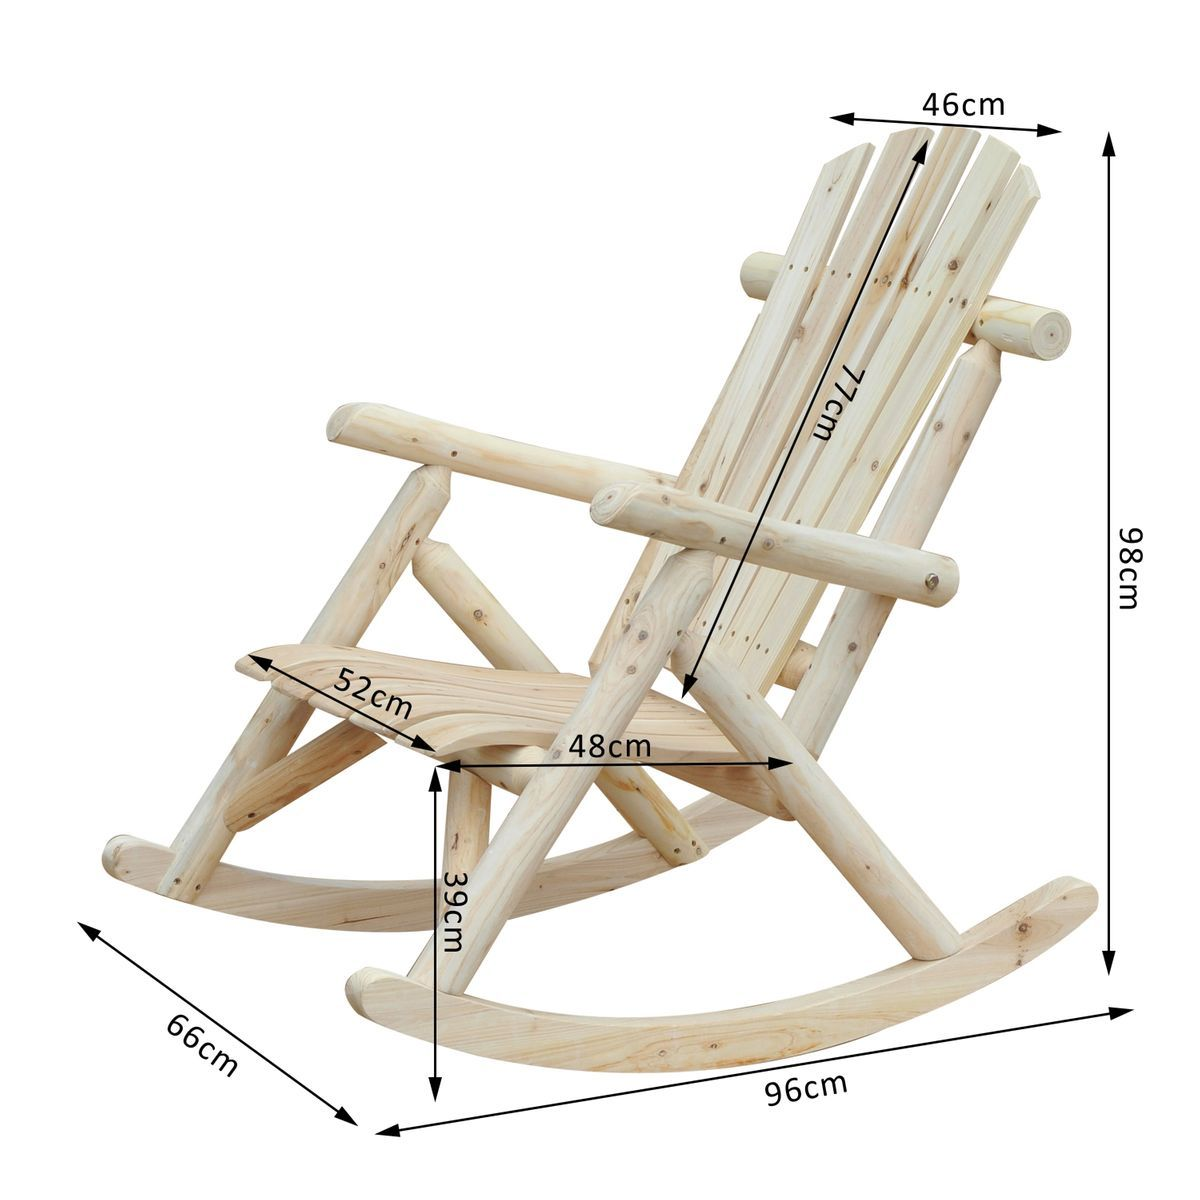 Fauteuil De Jardin Rocking Chair Bois De Pin Outsunny Kucuk Ahsap Projeleri Palet Sandalye Ahsap Projeleri